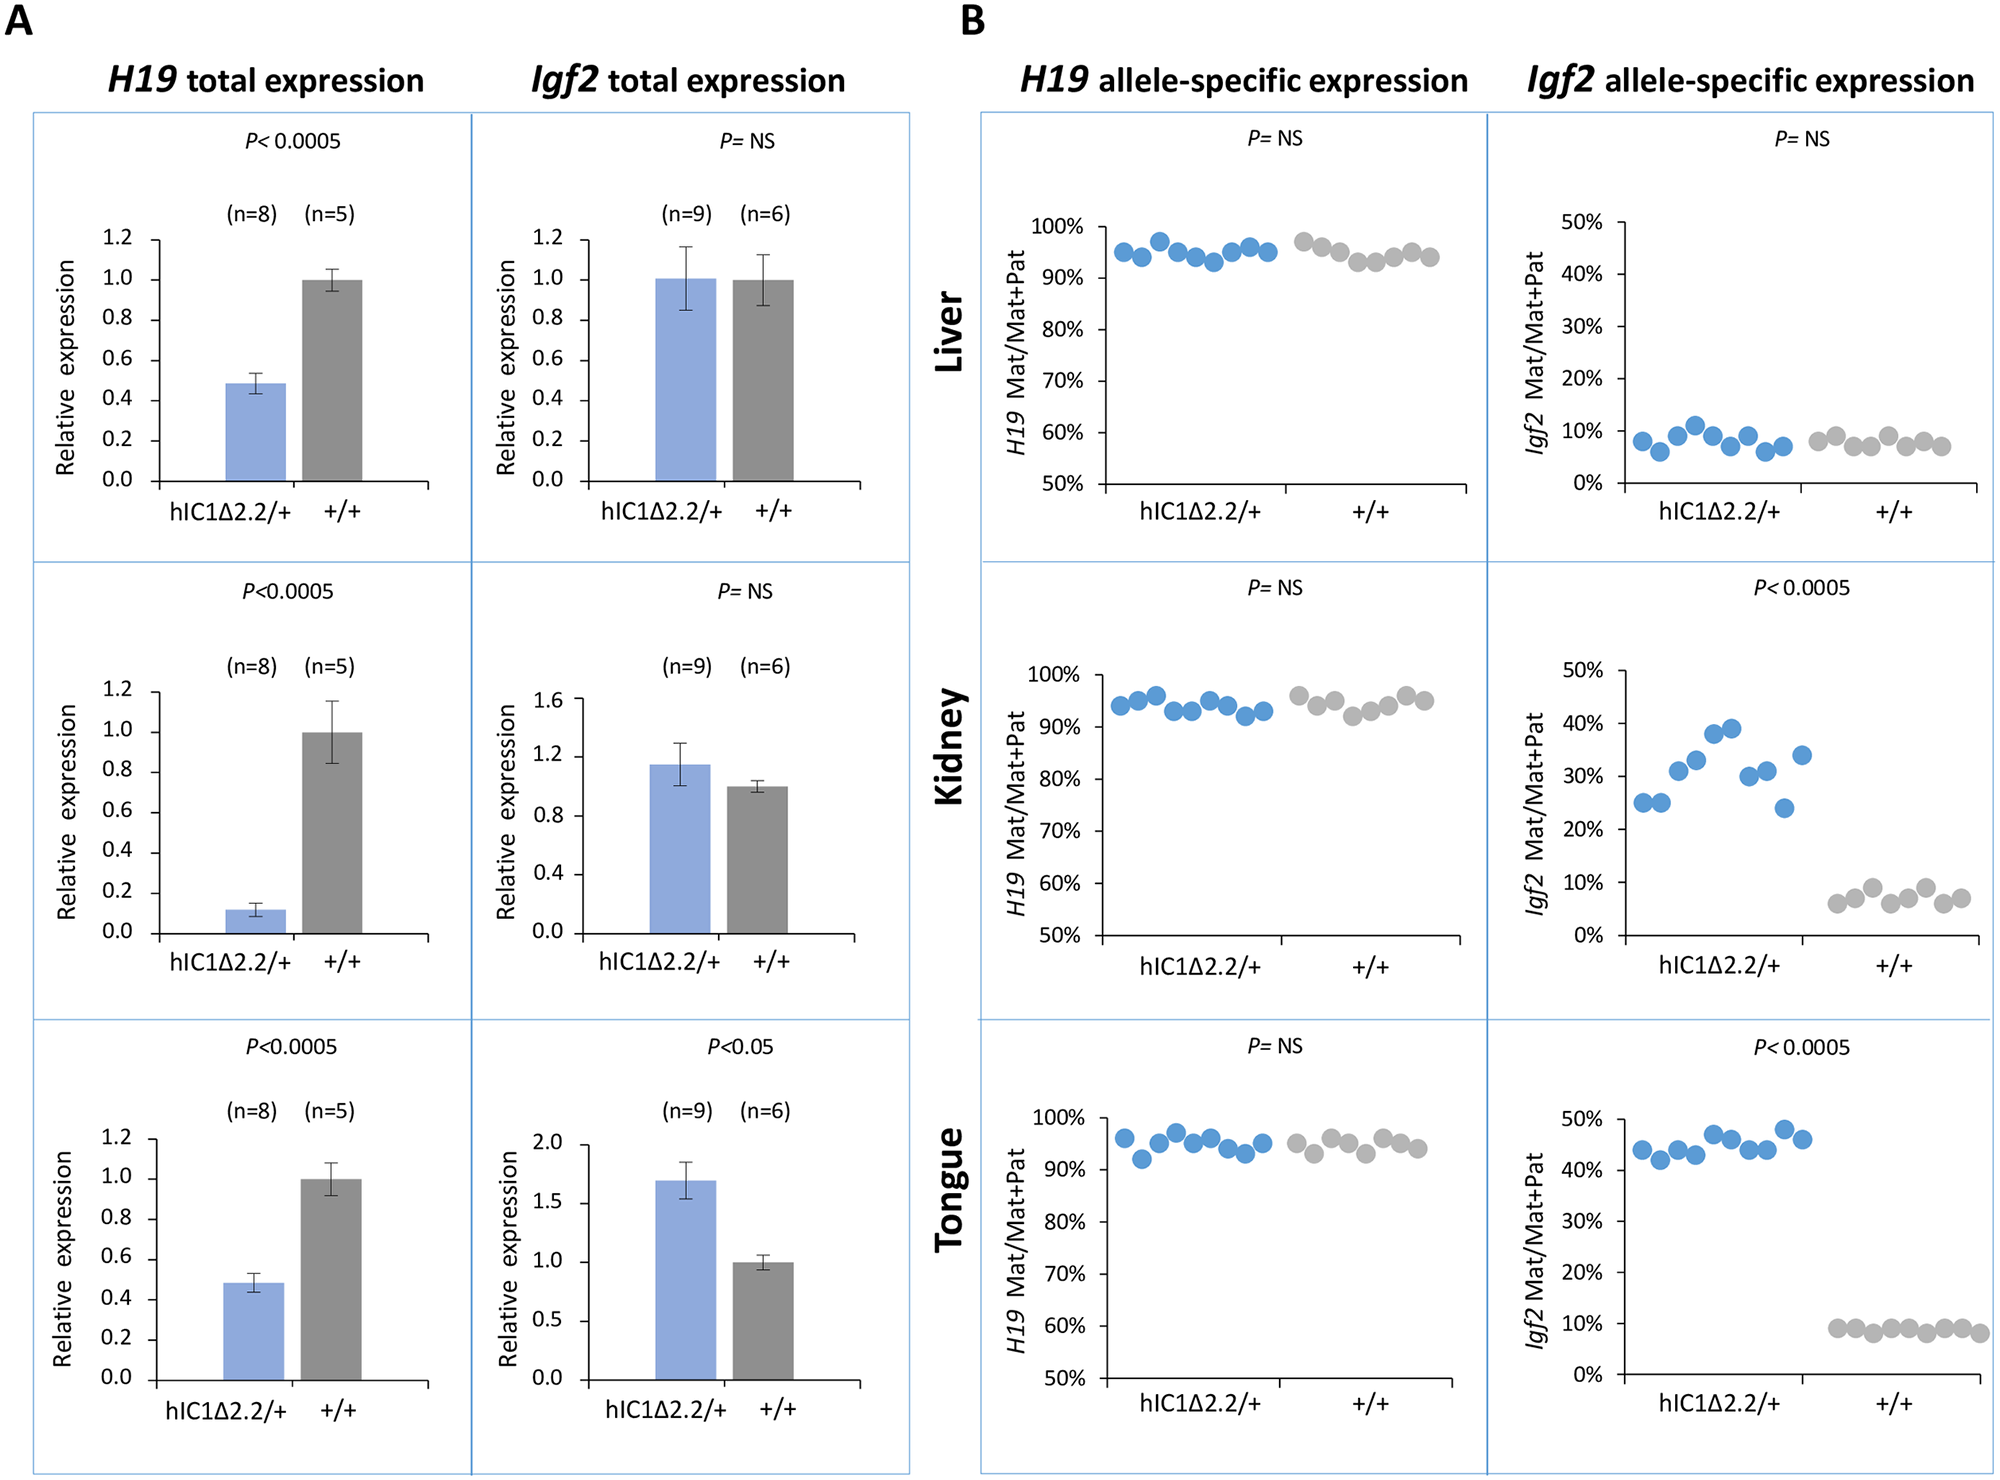 Analysis of <i>H19</i> and <i>Igf2</i> expression in <i>H19</i><sup><i>hIC1</i>Δ<i>2</i>.<i>2/+</i></sup> newborn mice.